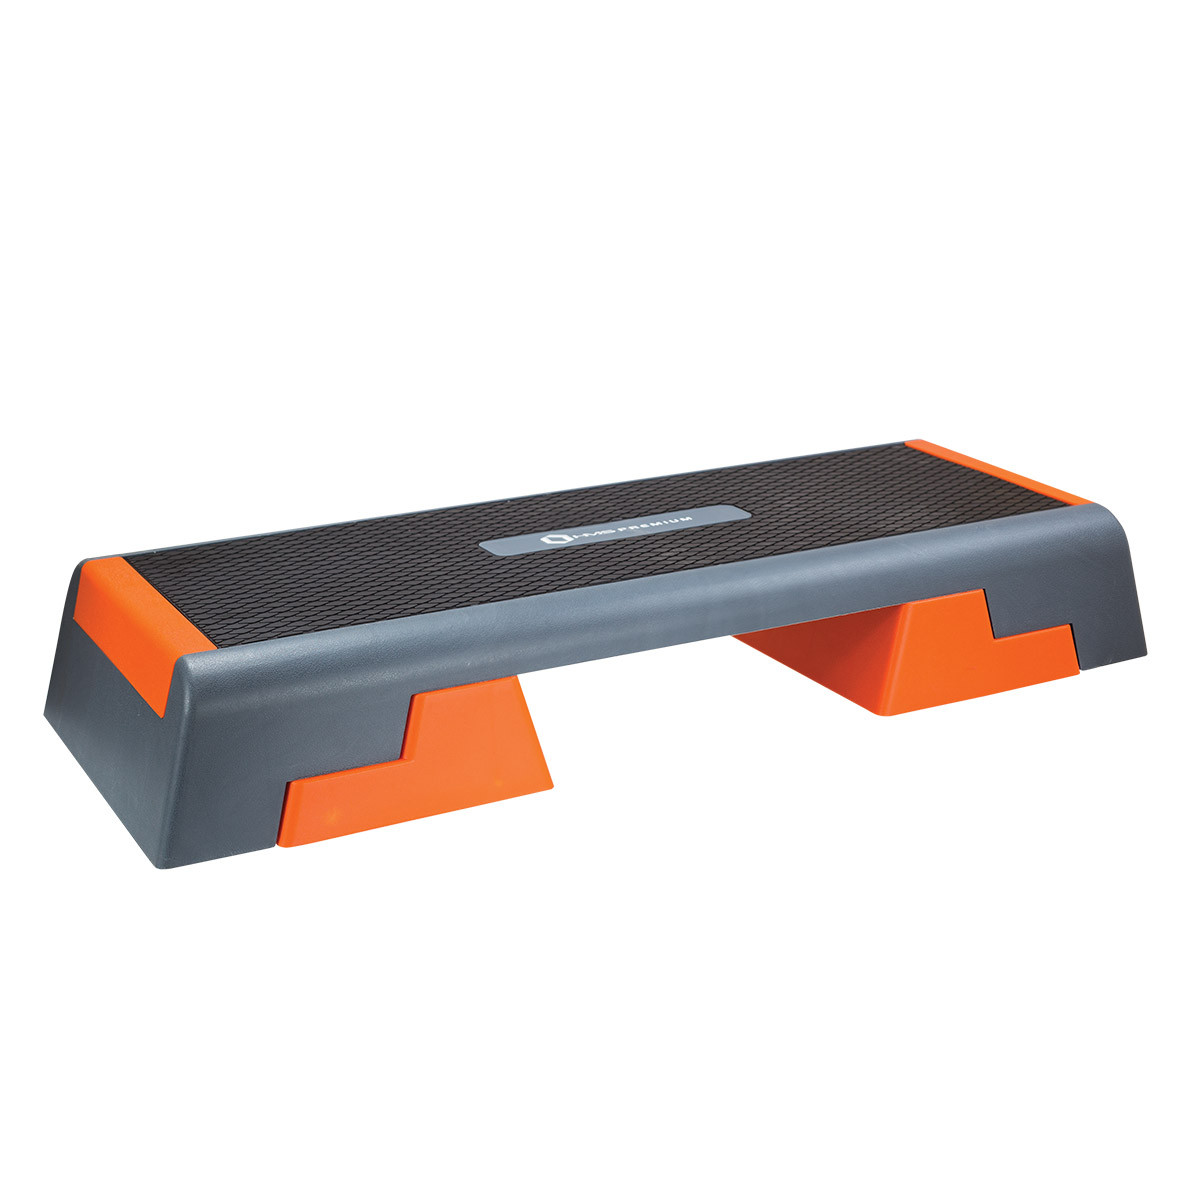 Stepper aerobic si fitness, reglabil pe 3 nivele, negru-portocaliu